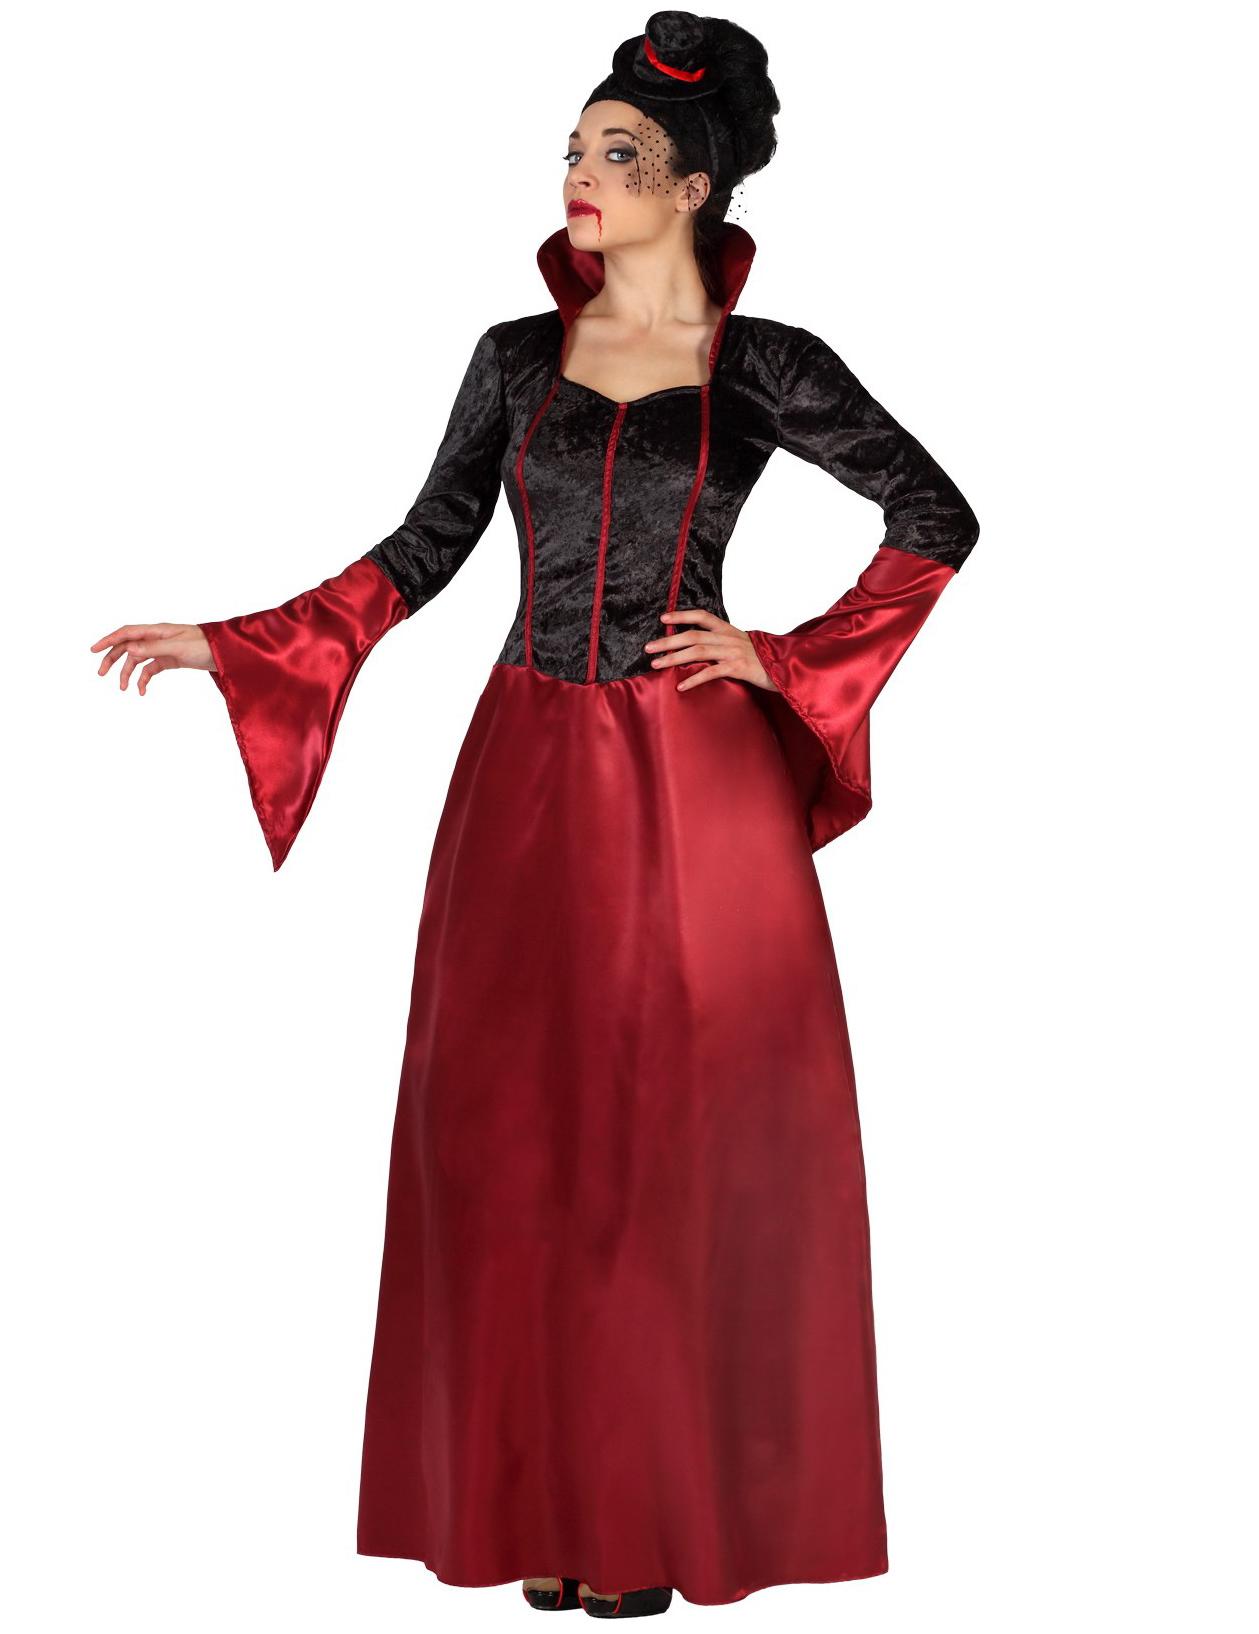 D guisement vampire rouge et noir femme halloween - Maquillage vampire femme adulte ...